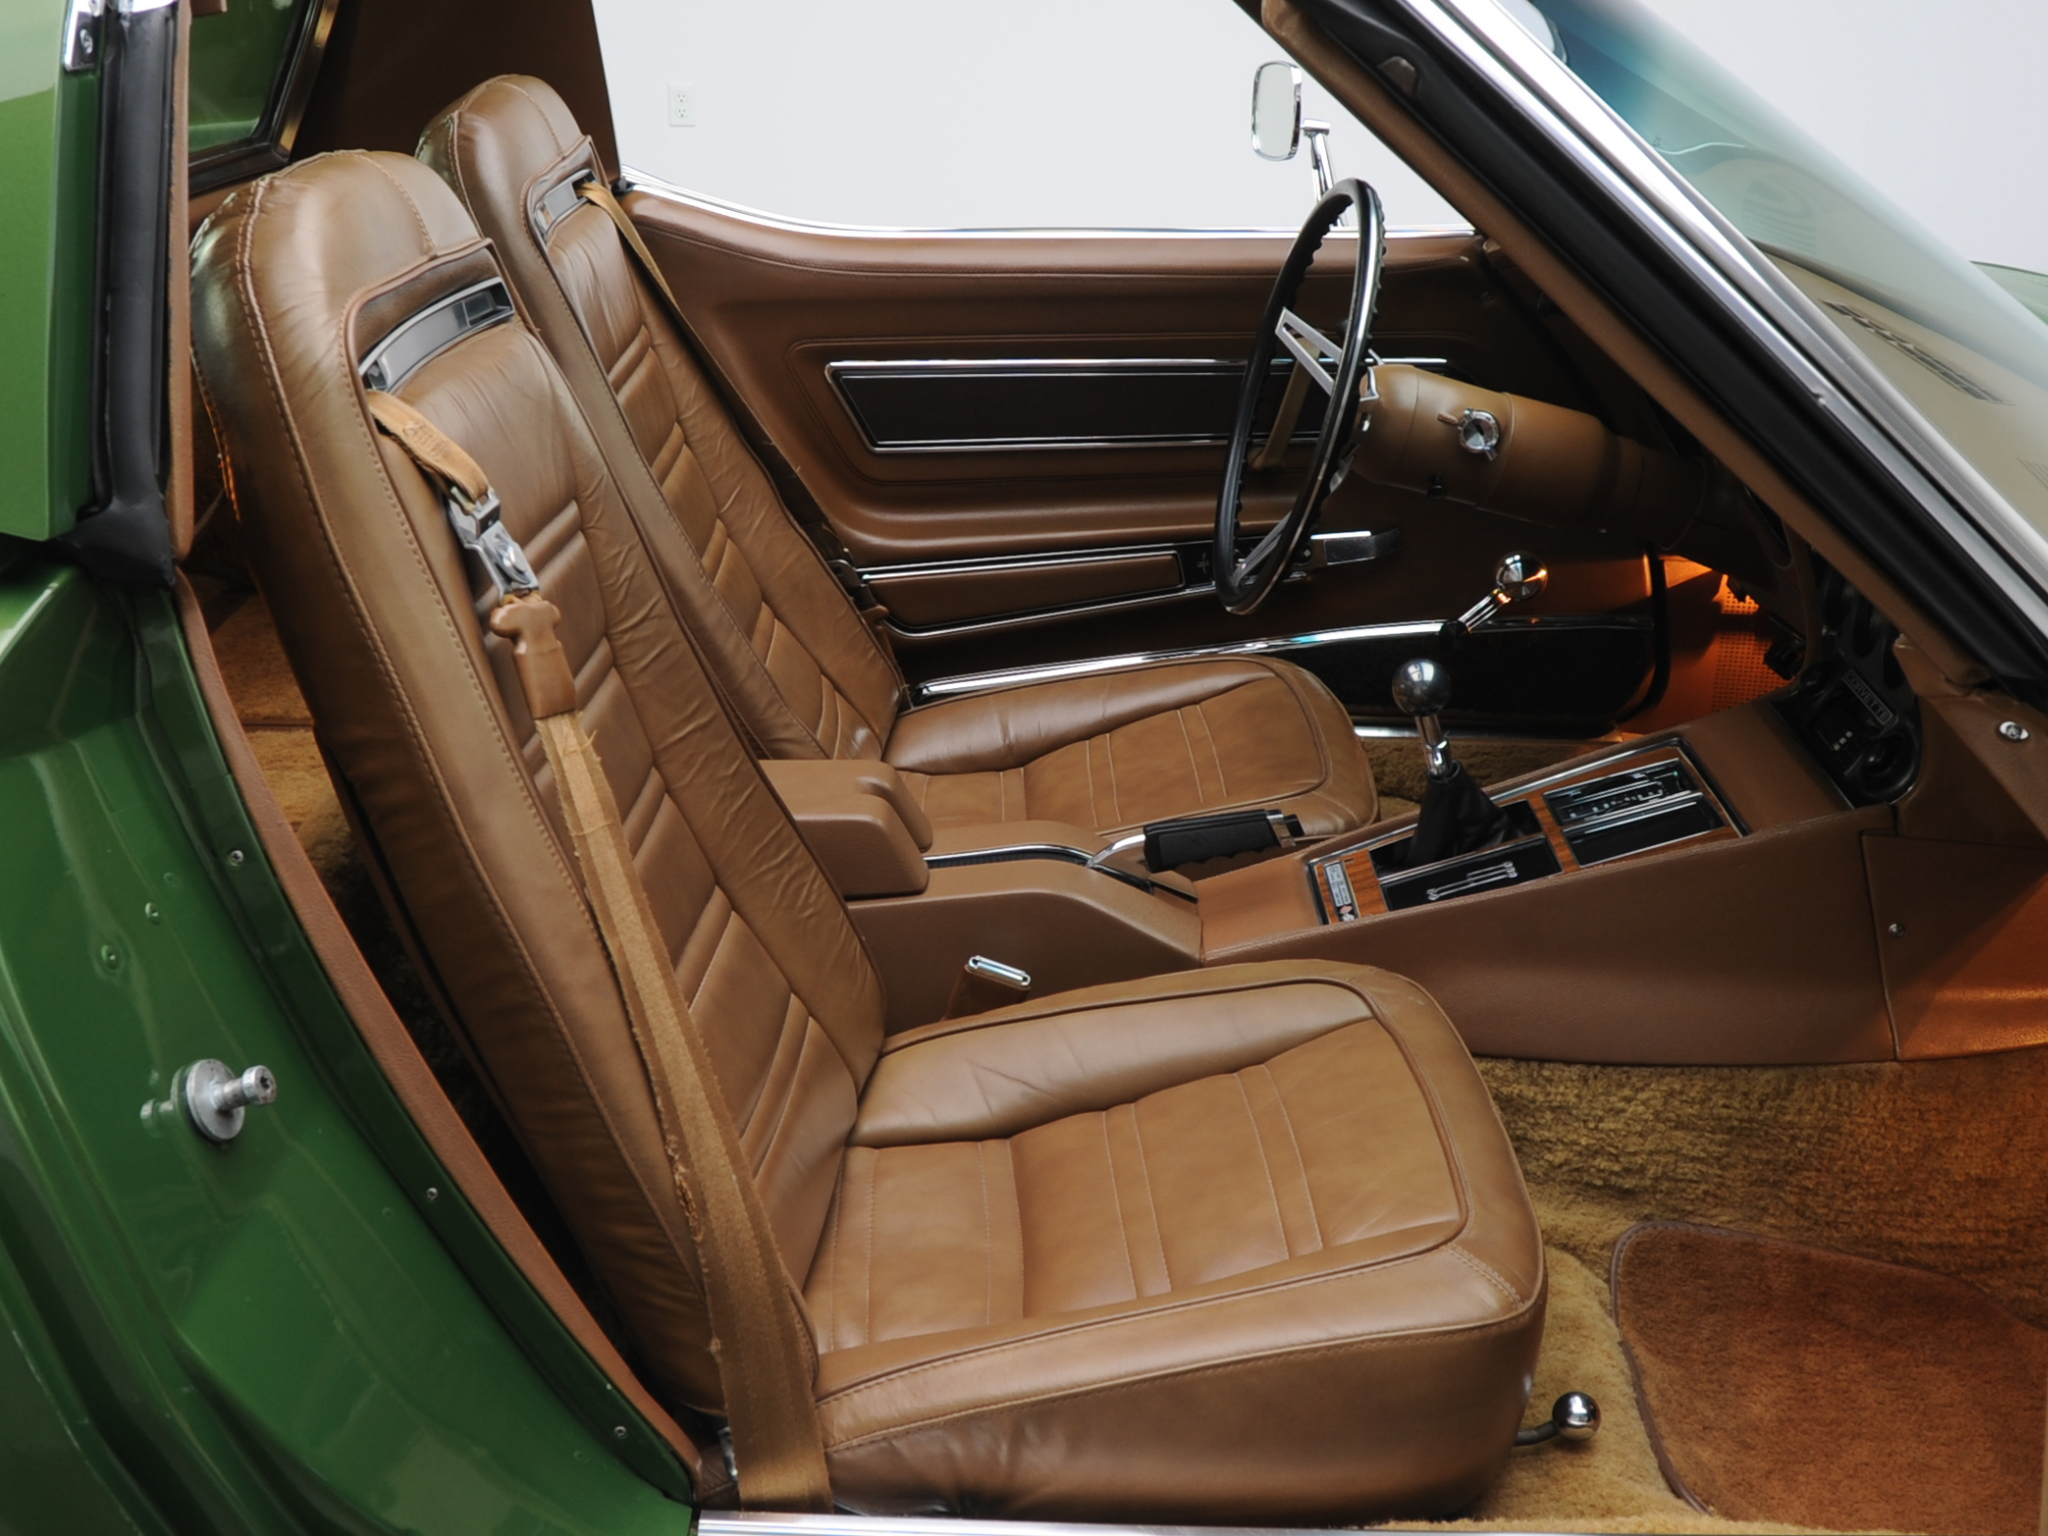 1970 chevrolet corvette stingray 454 c3 supercar muscle classic interior f wallpaper. Black Bedroom Furniture Sets. Home Design Ideas